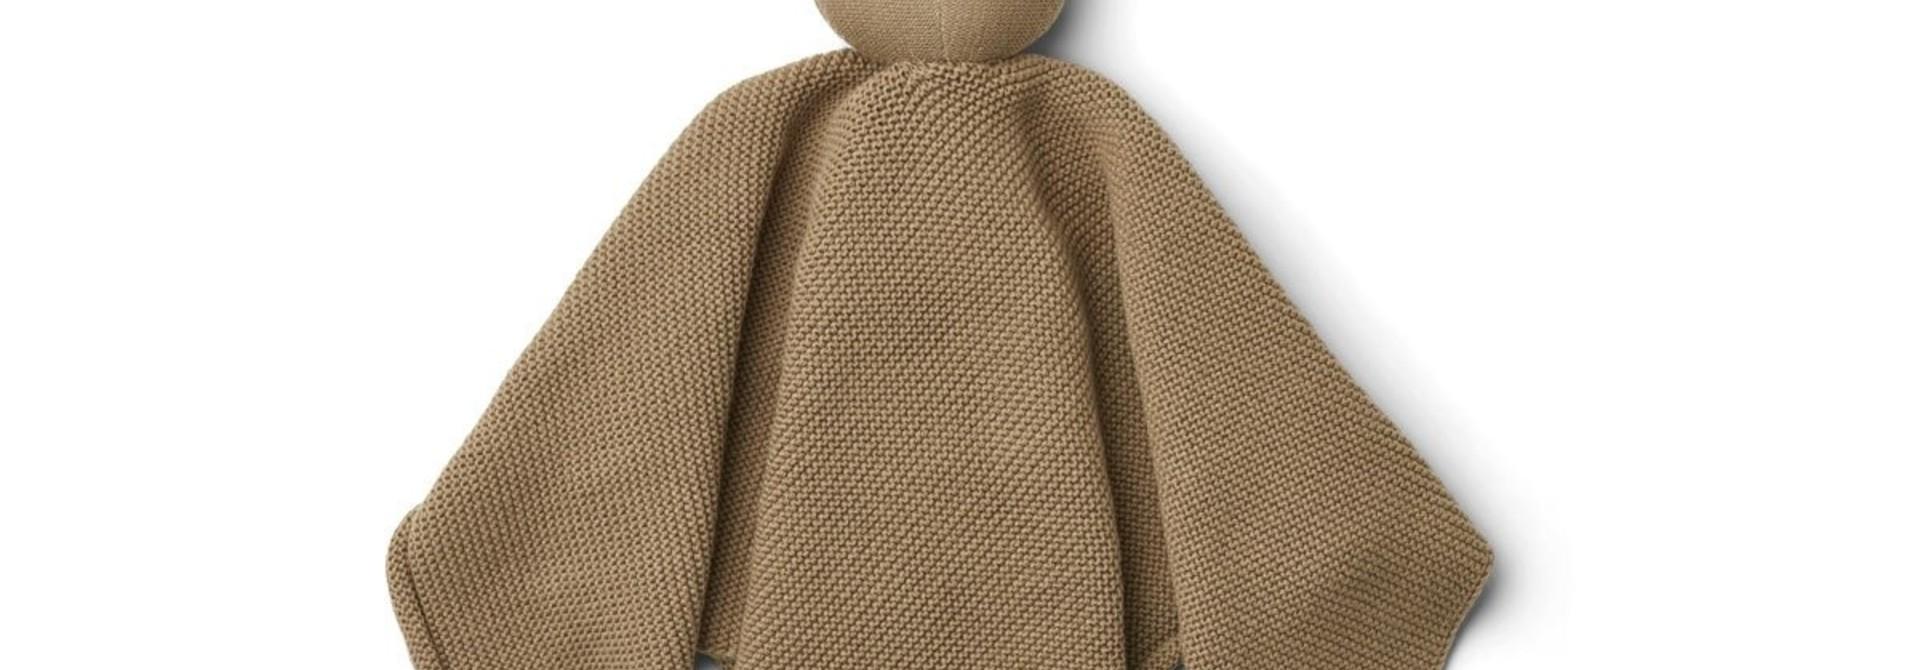 Milo knit cuddle cloth